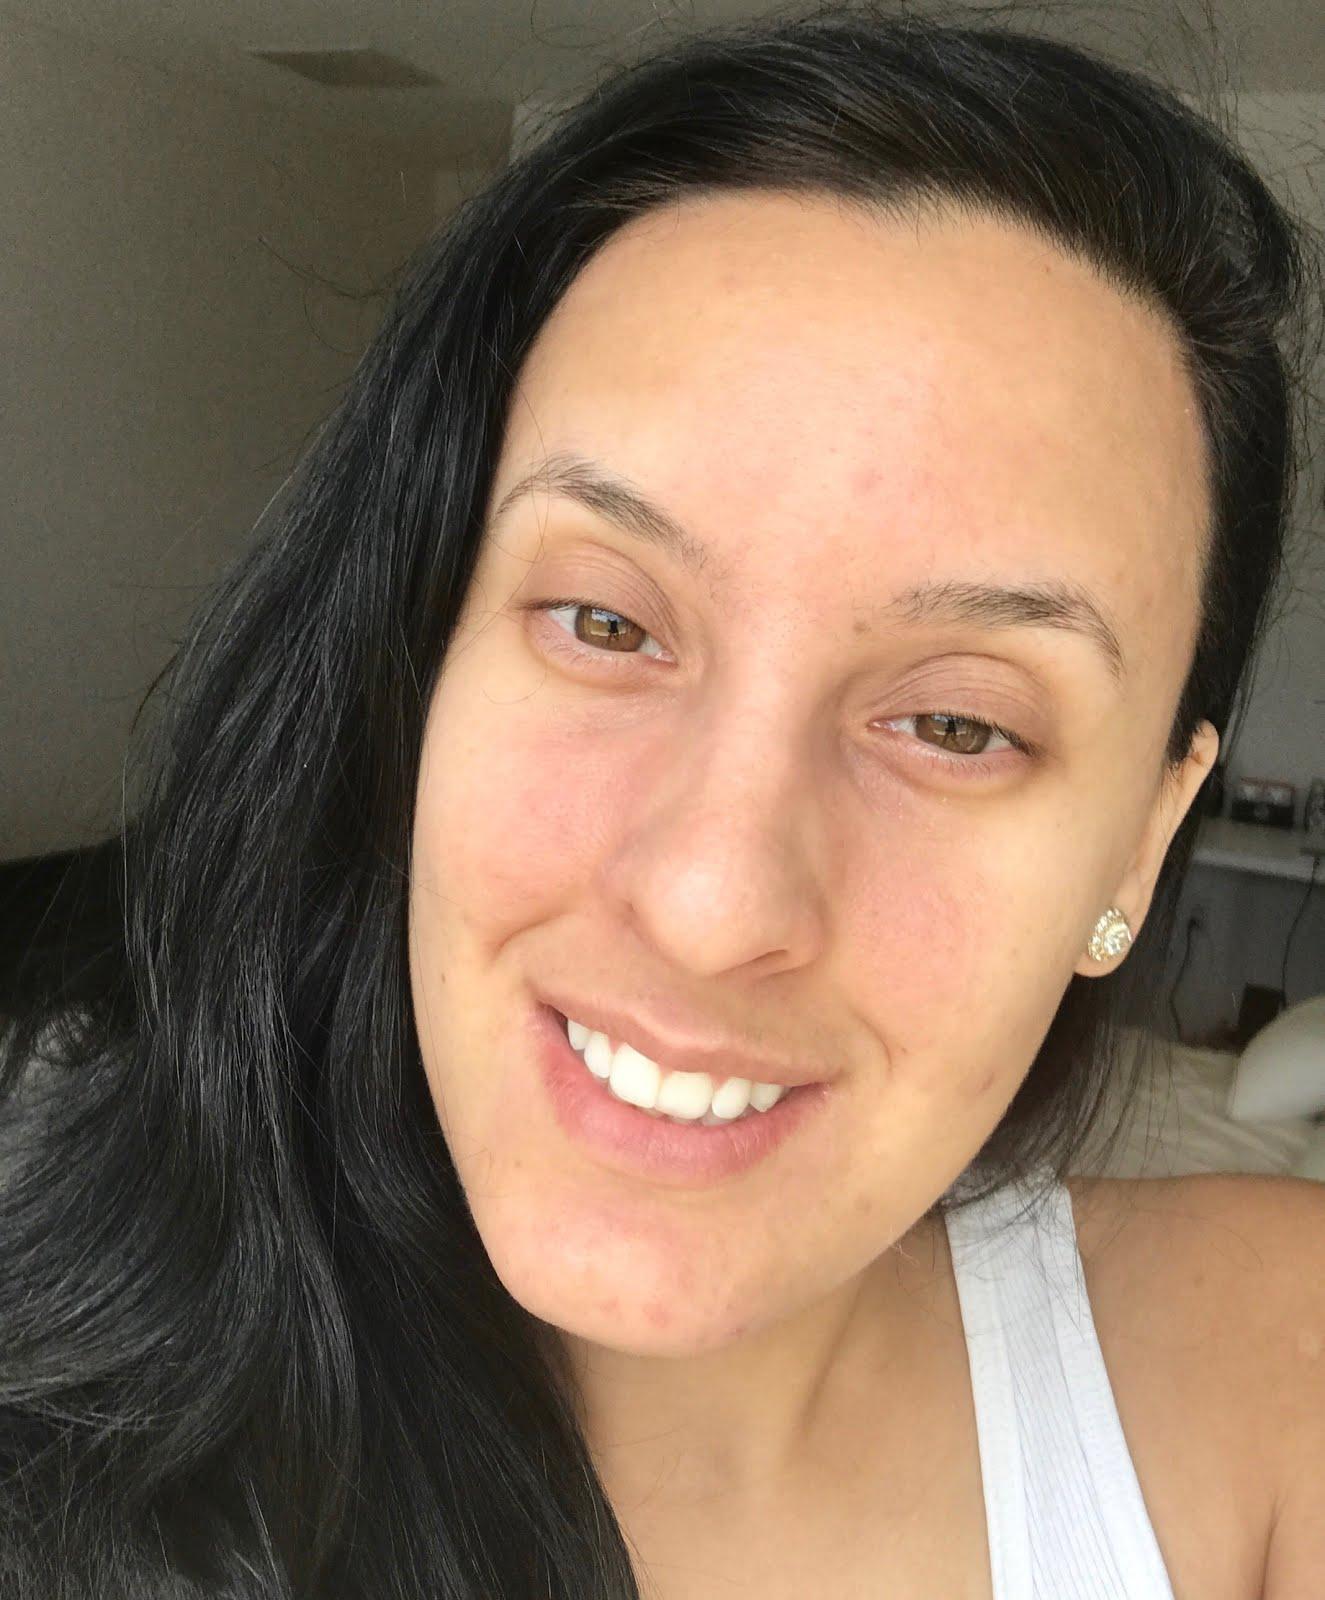 Olay-28-Day-Skin-Study-at-Walmart-New-Skincare-Routine-Vivi-Brizuela-PinkOrchidMakeup